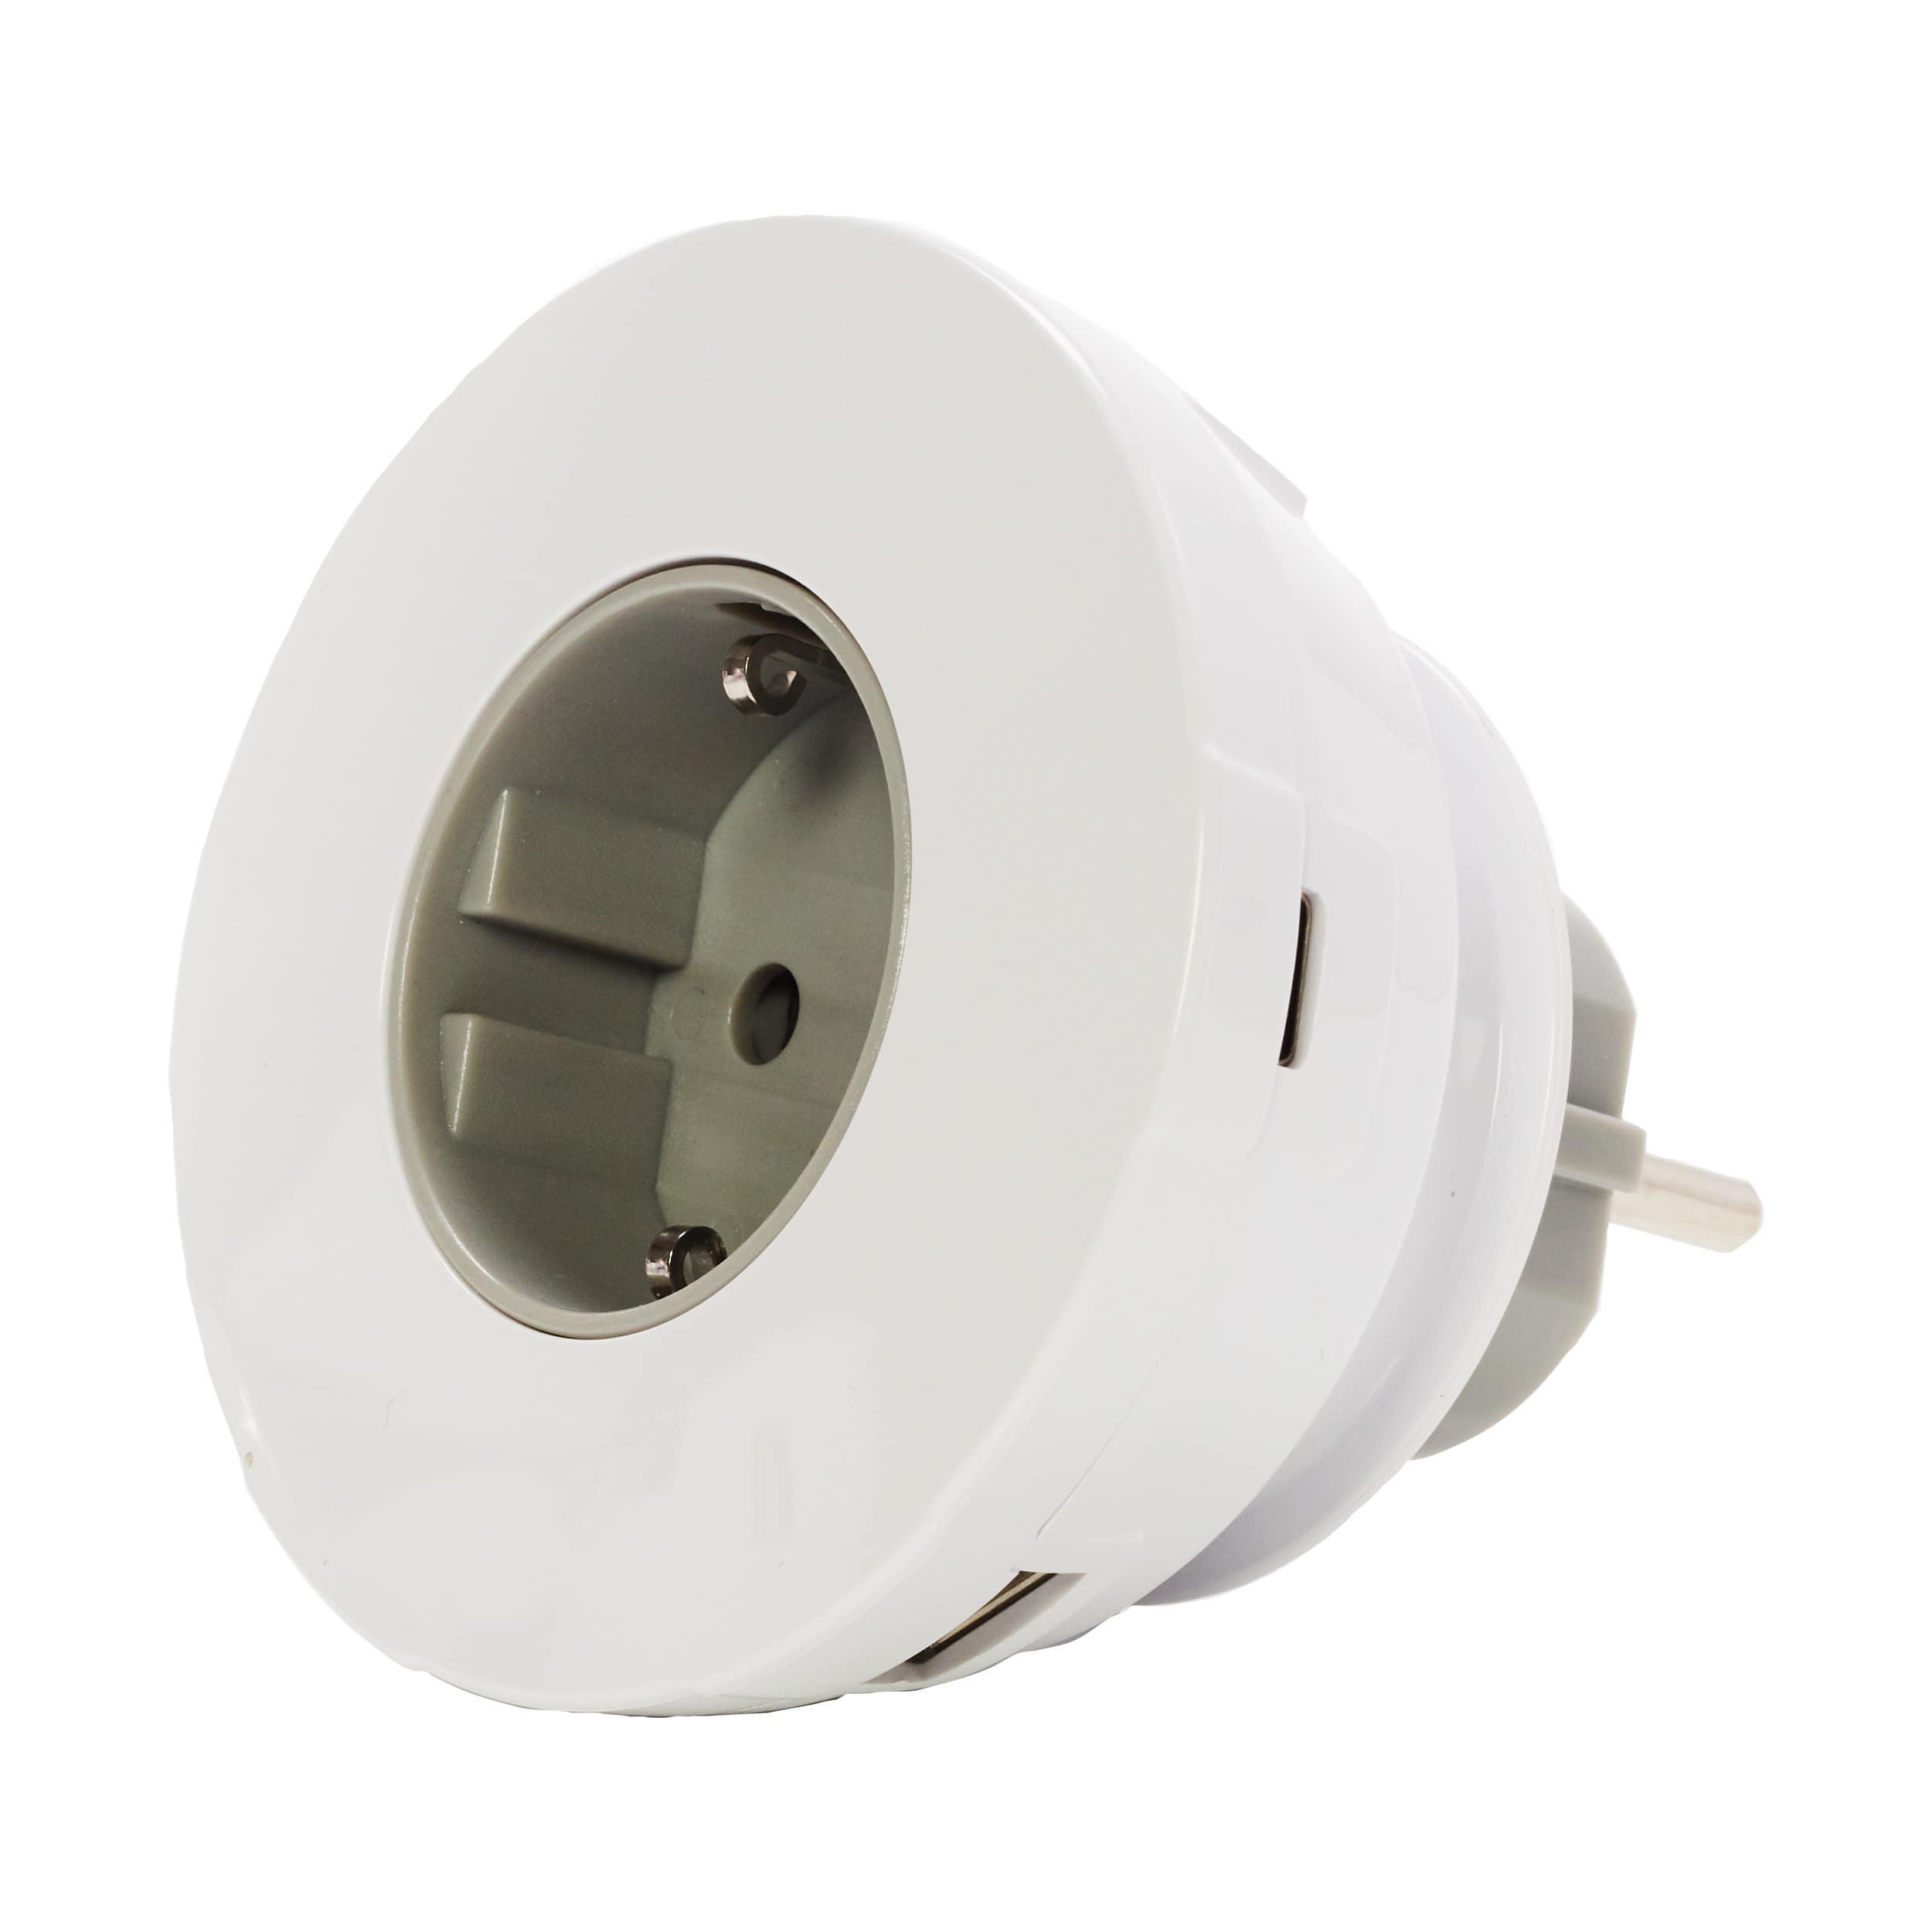 USB Plug Steckdose und Ladestation